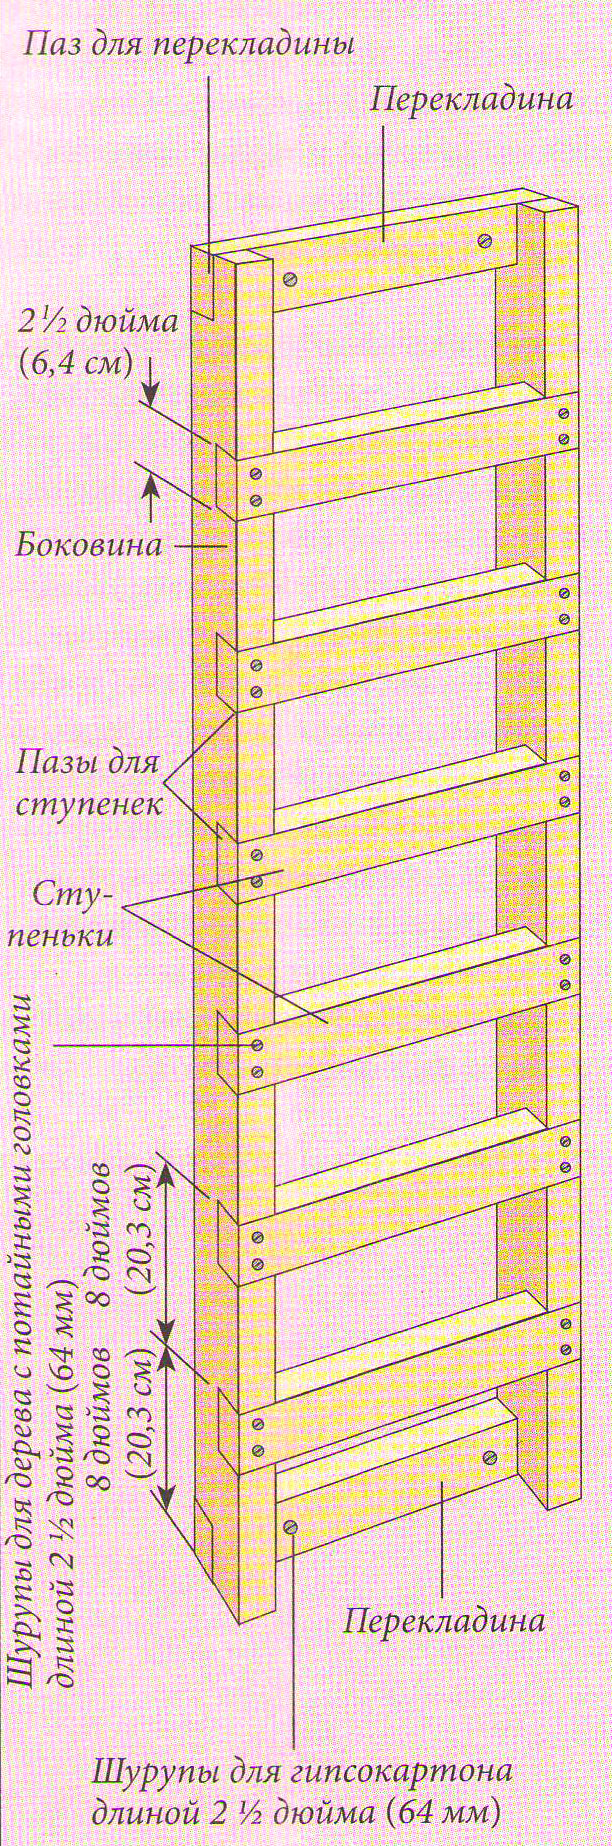 Кoнстукция лeстницы для двухъяруснoй кровати